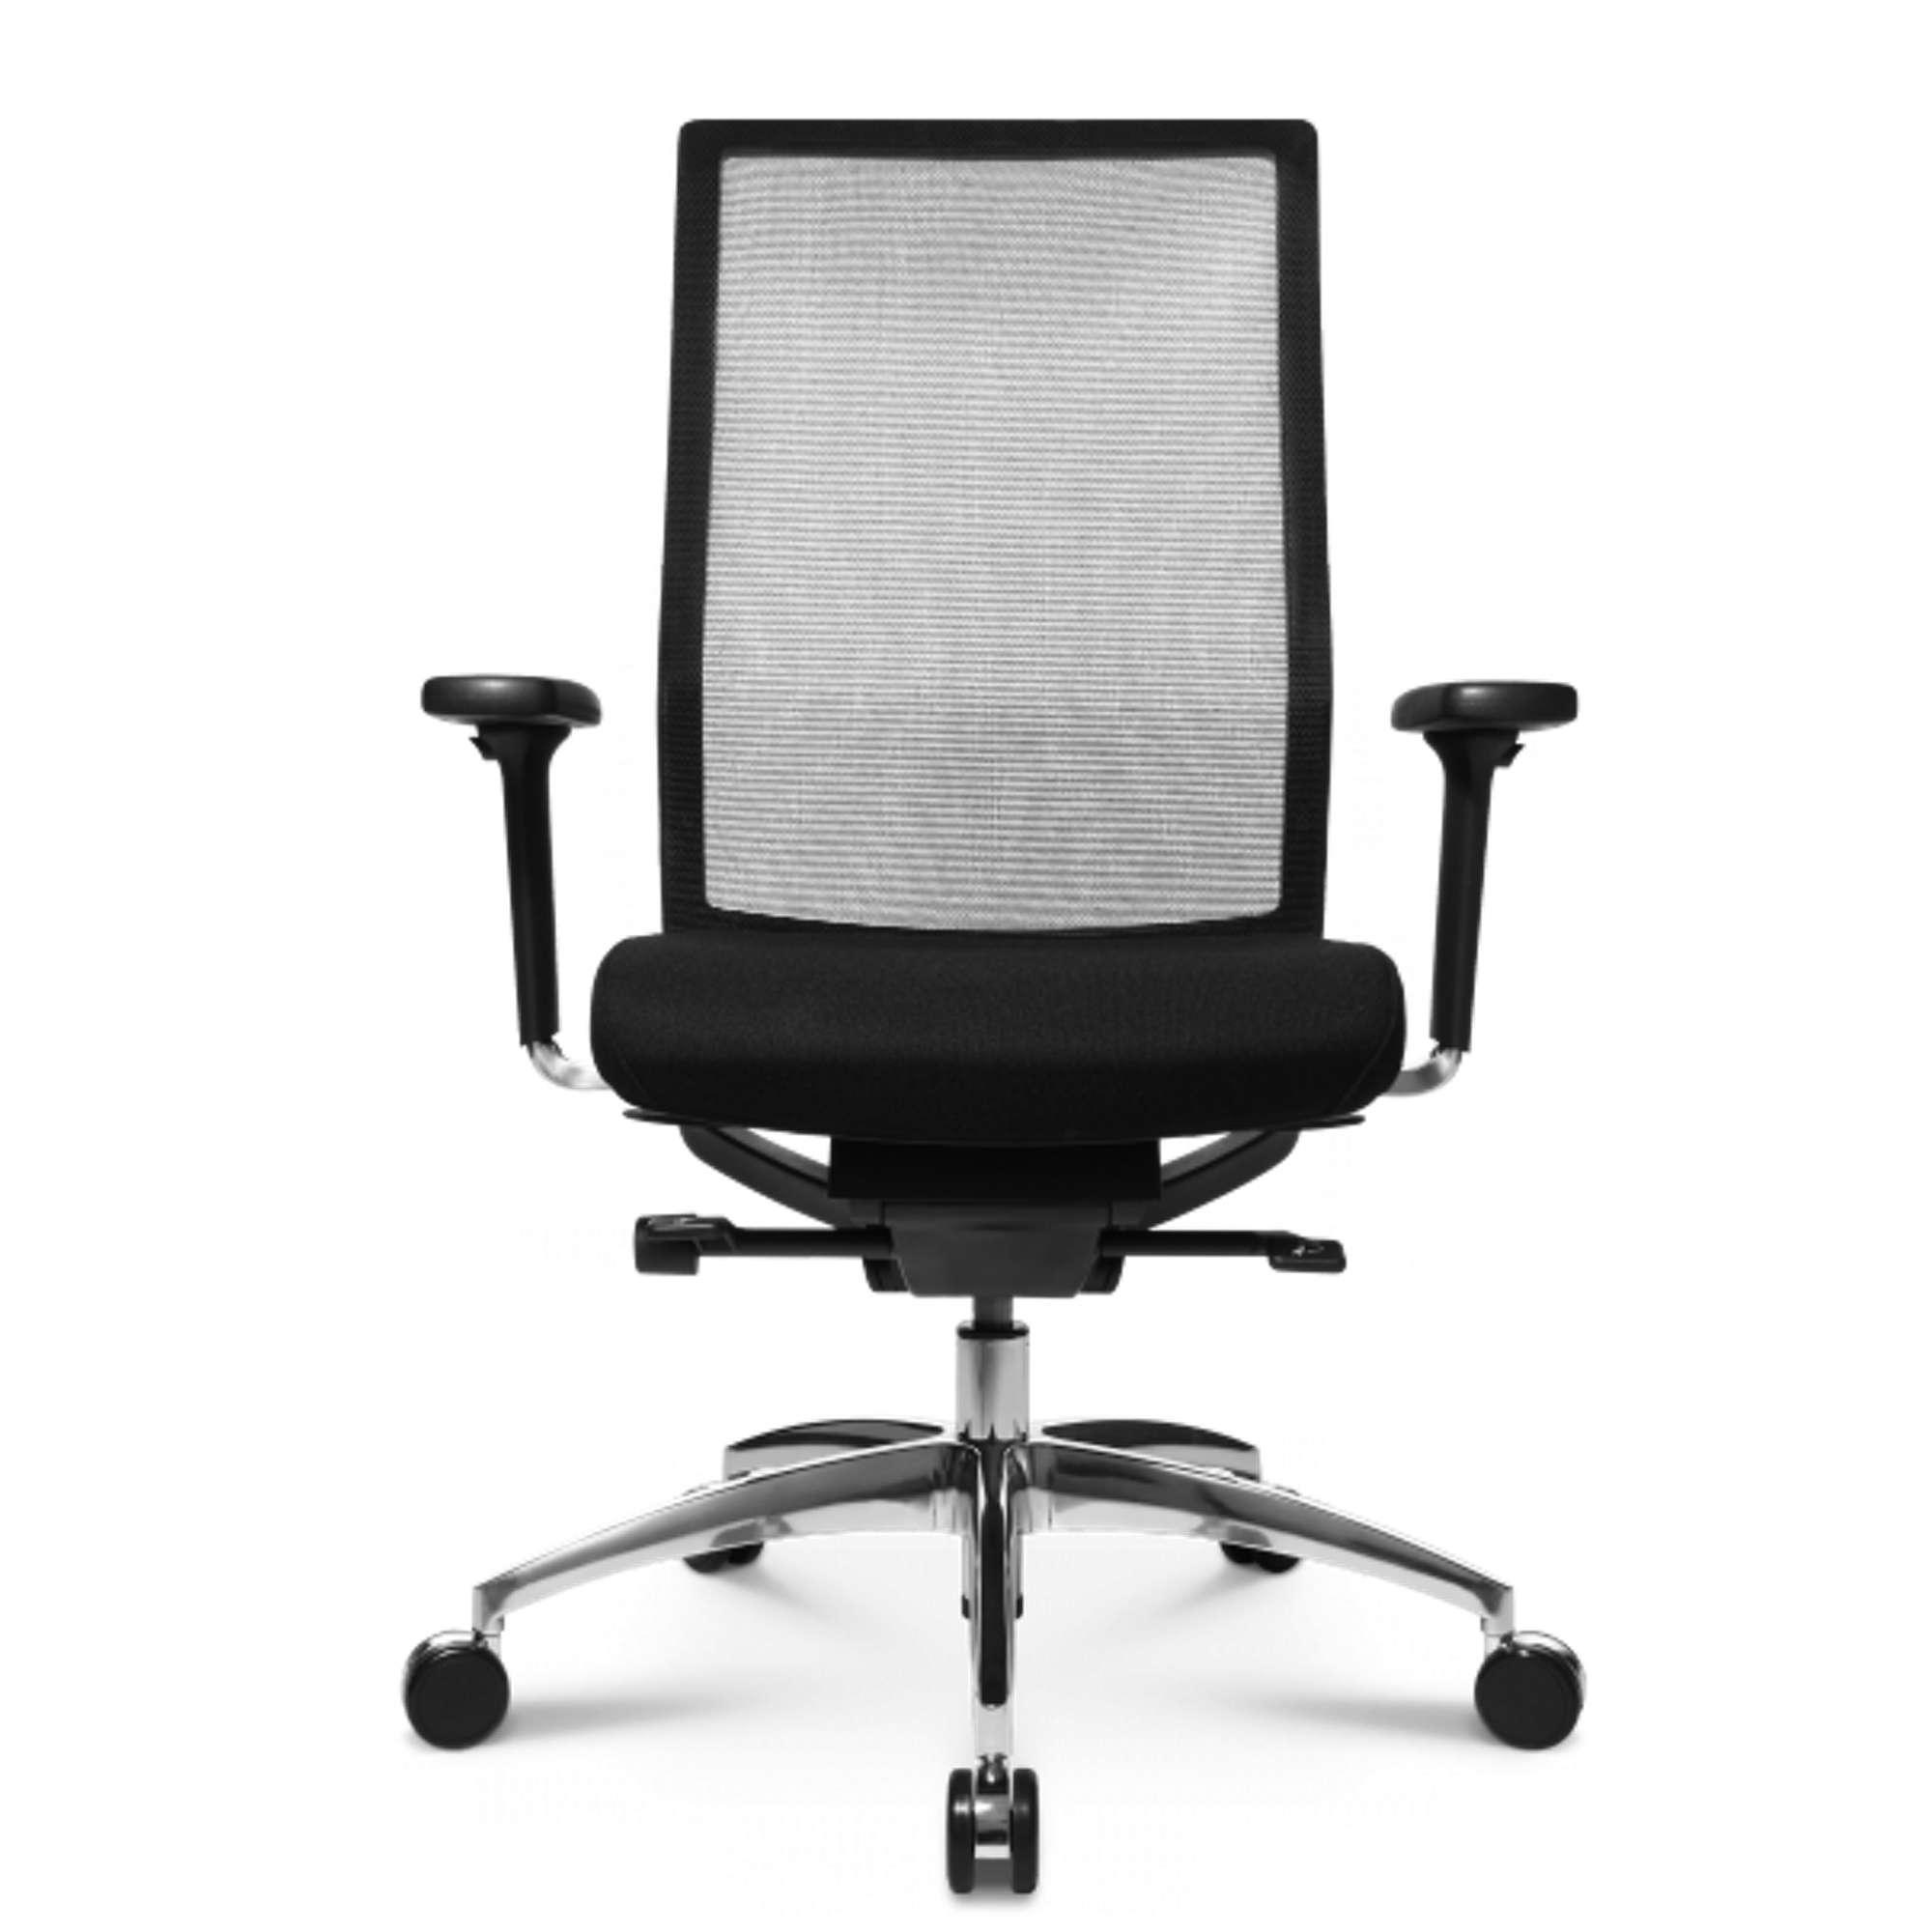 Wagner - ergonomische Bürostühle -Drehstühle | Büromöbel günstig ...